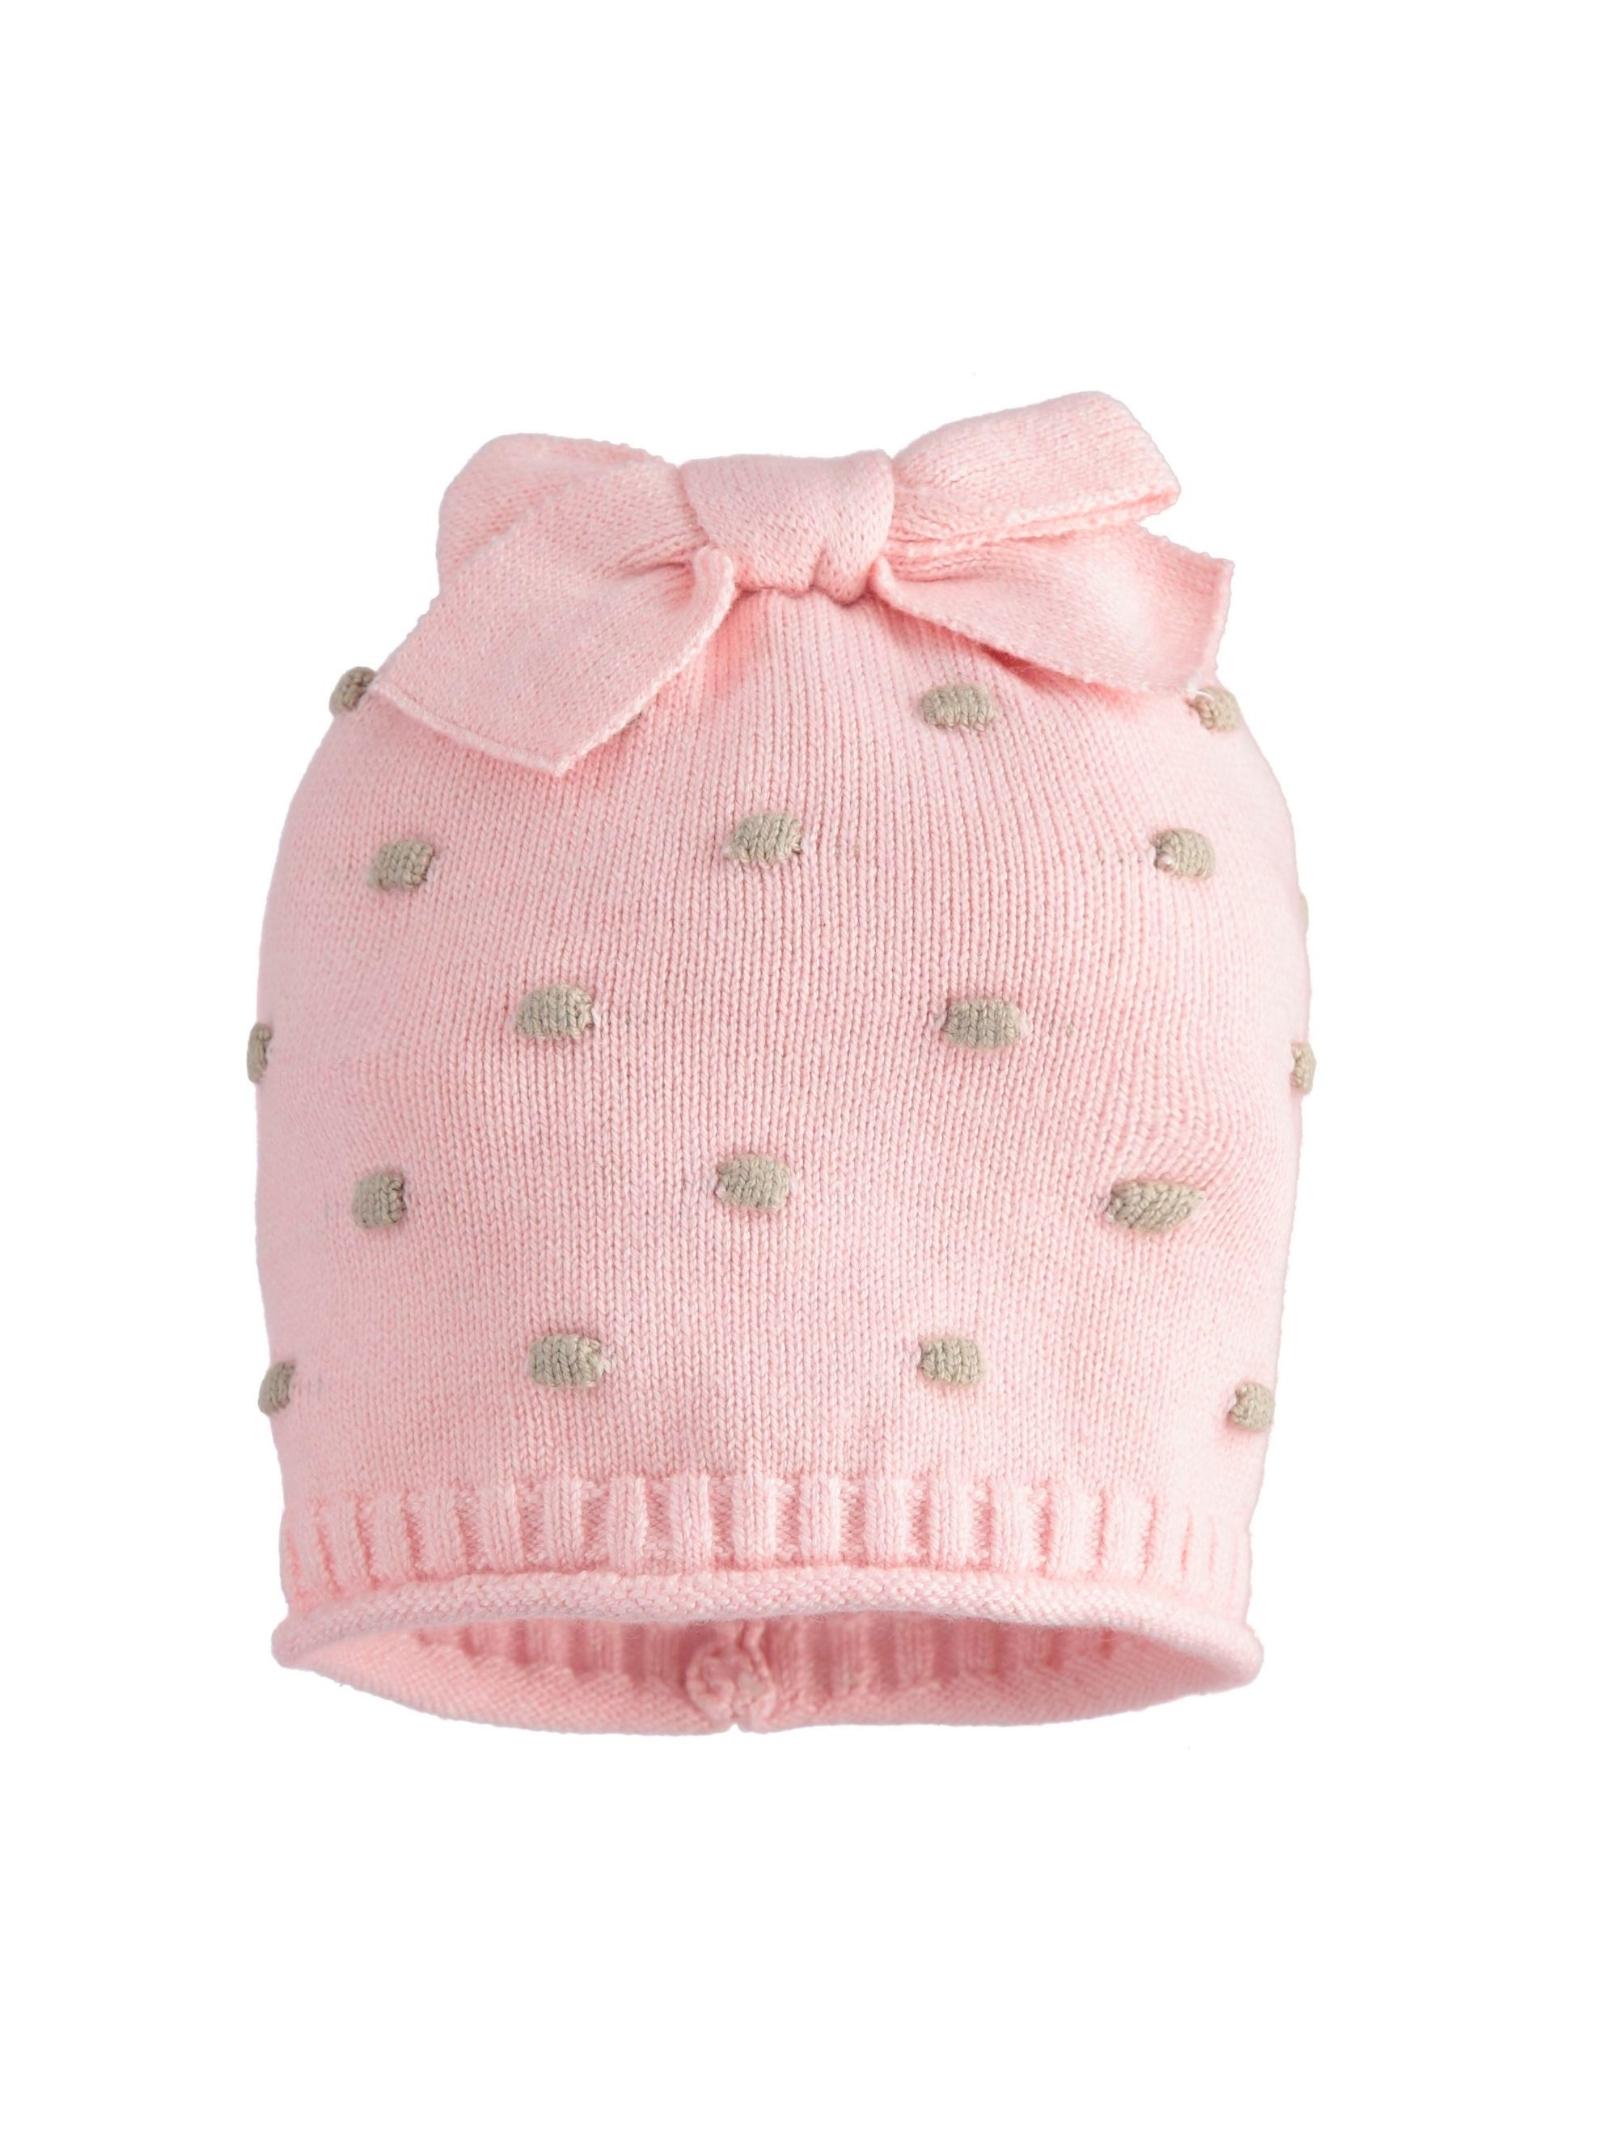 Cappello Pois Neonata MINIBANDA | Cappelli | 33325002715